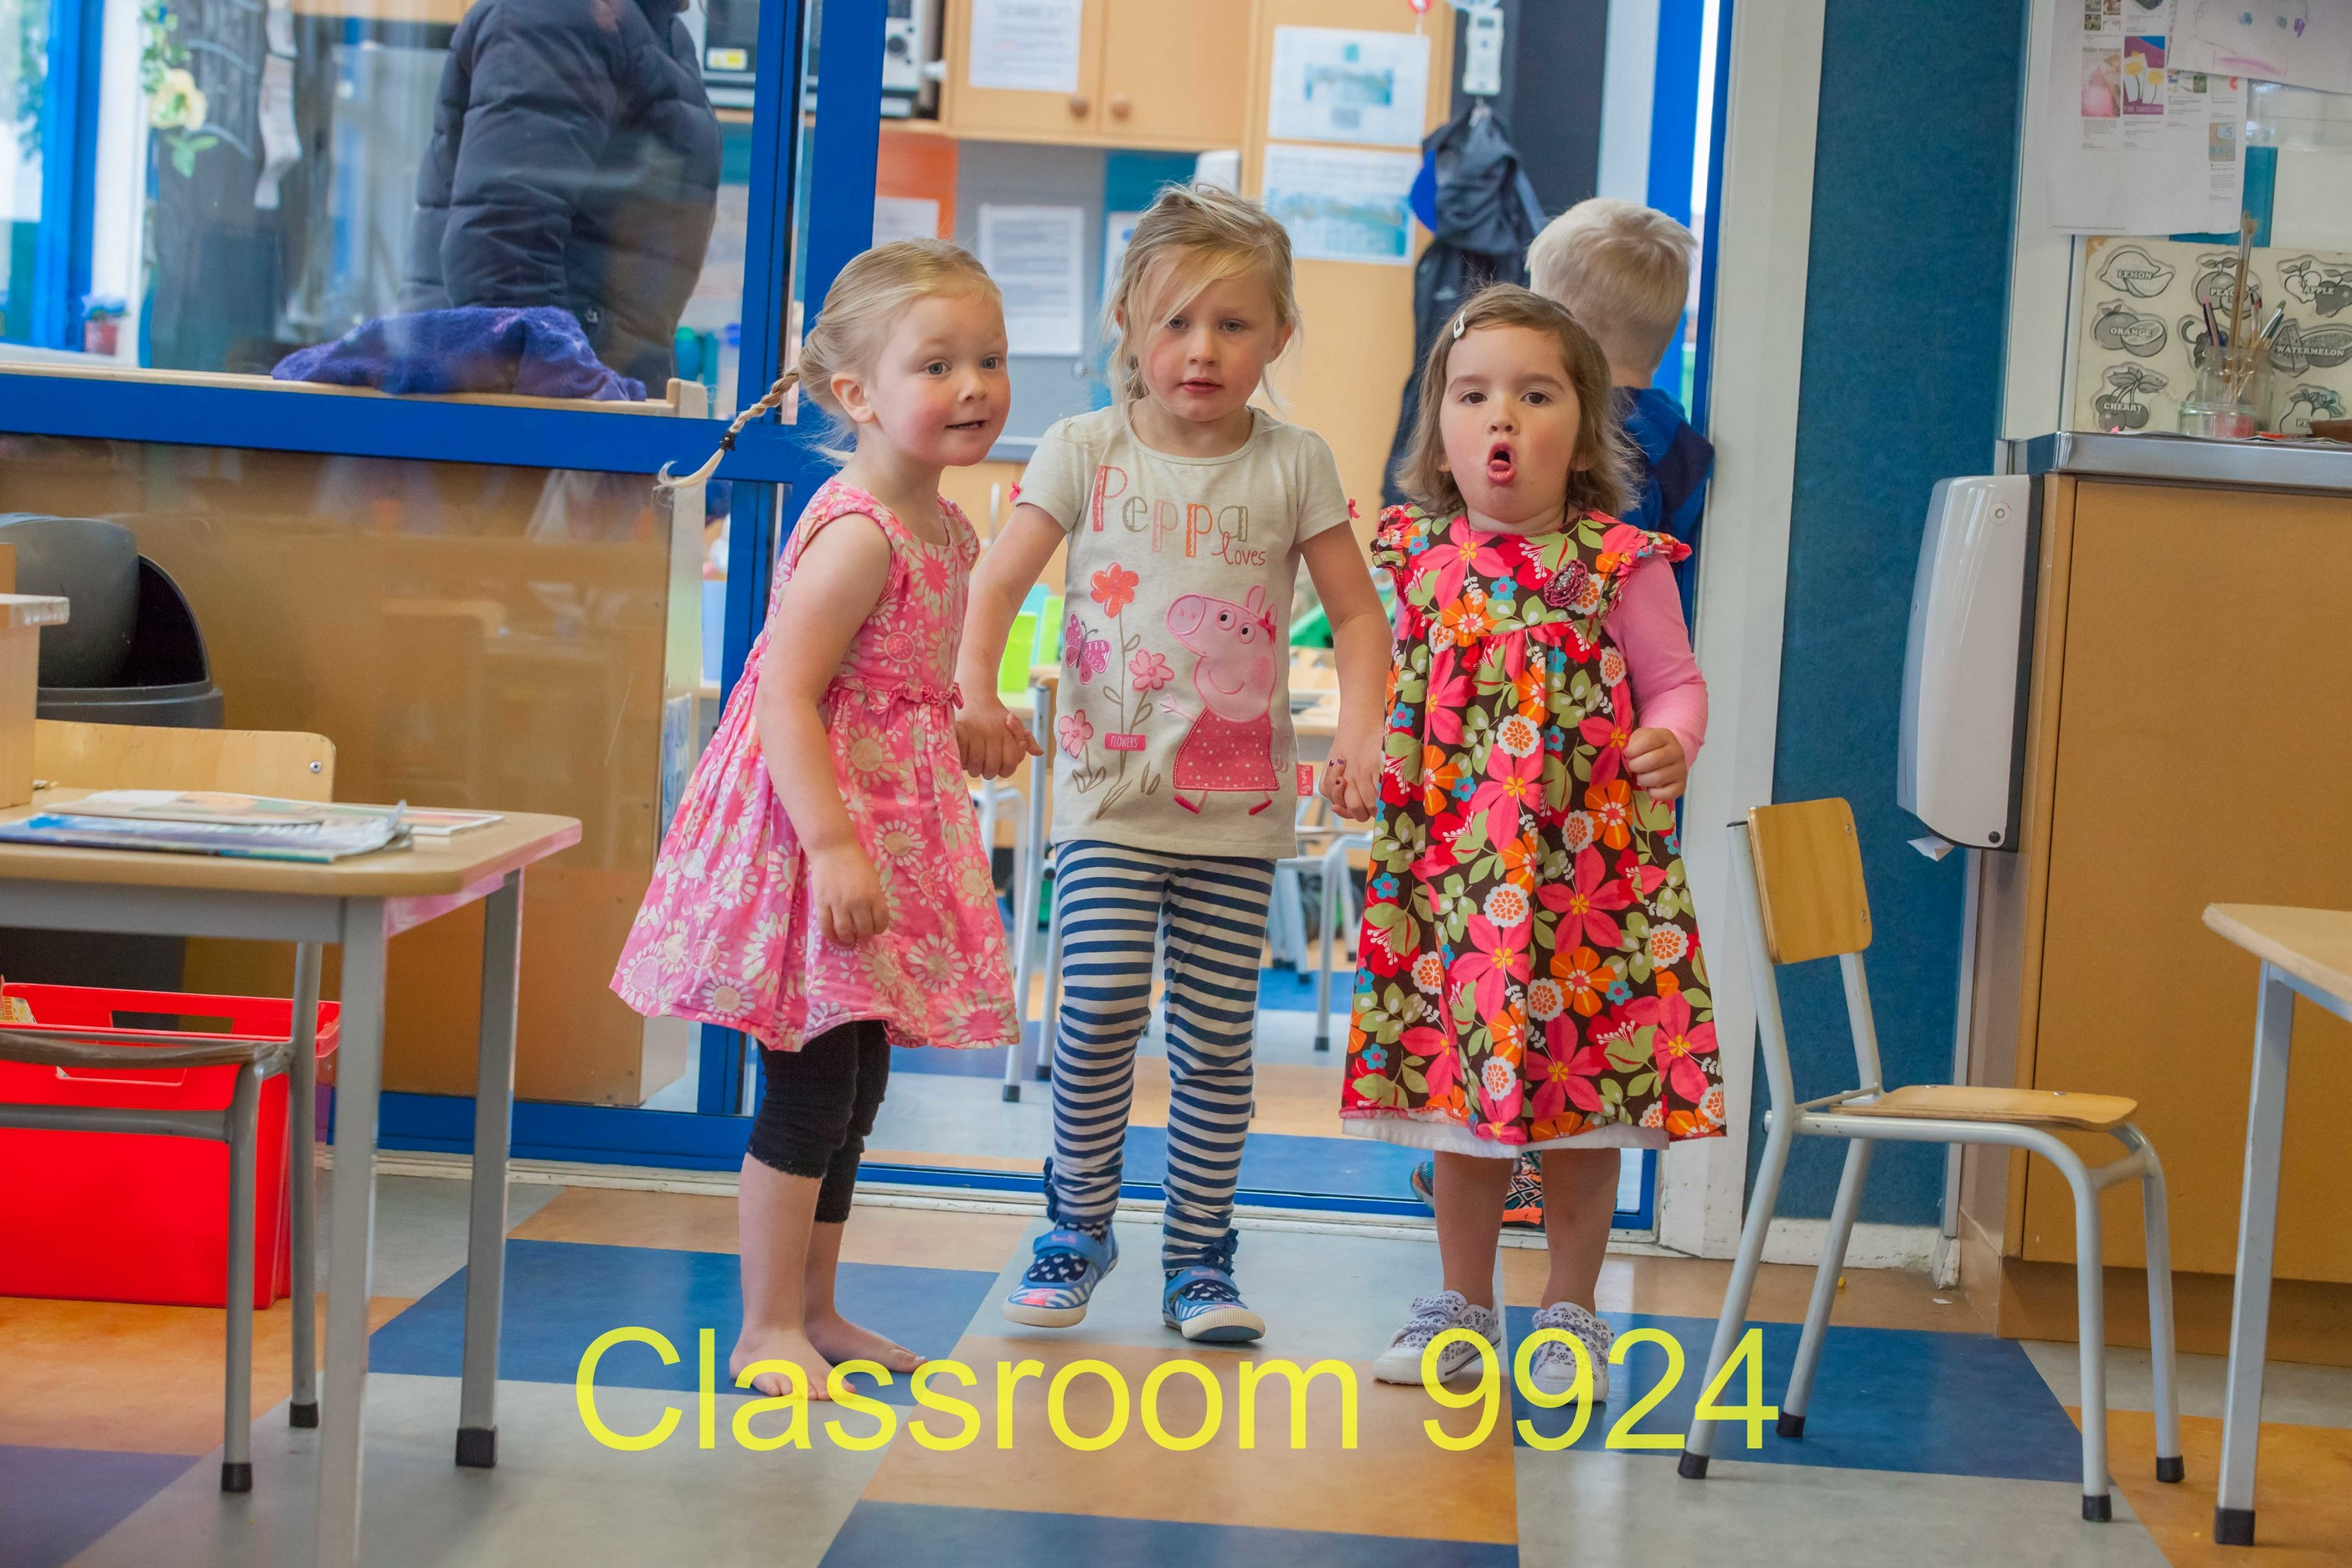 Classroom 9924